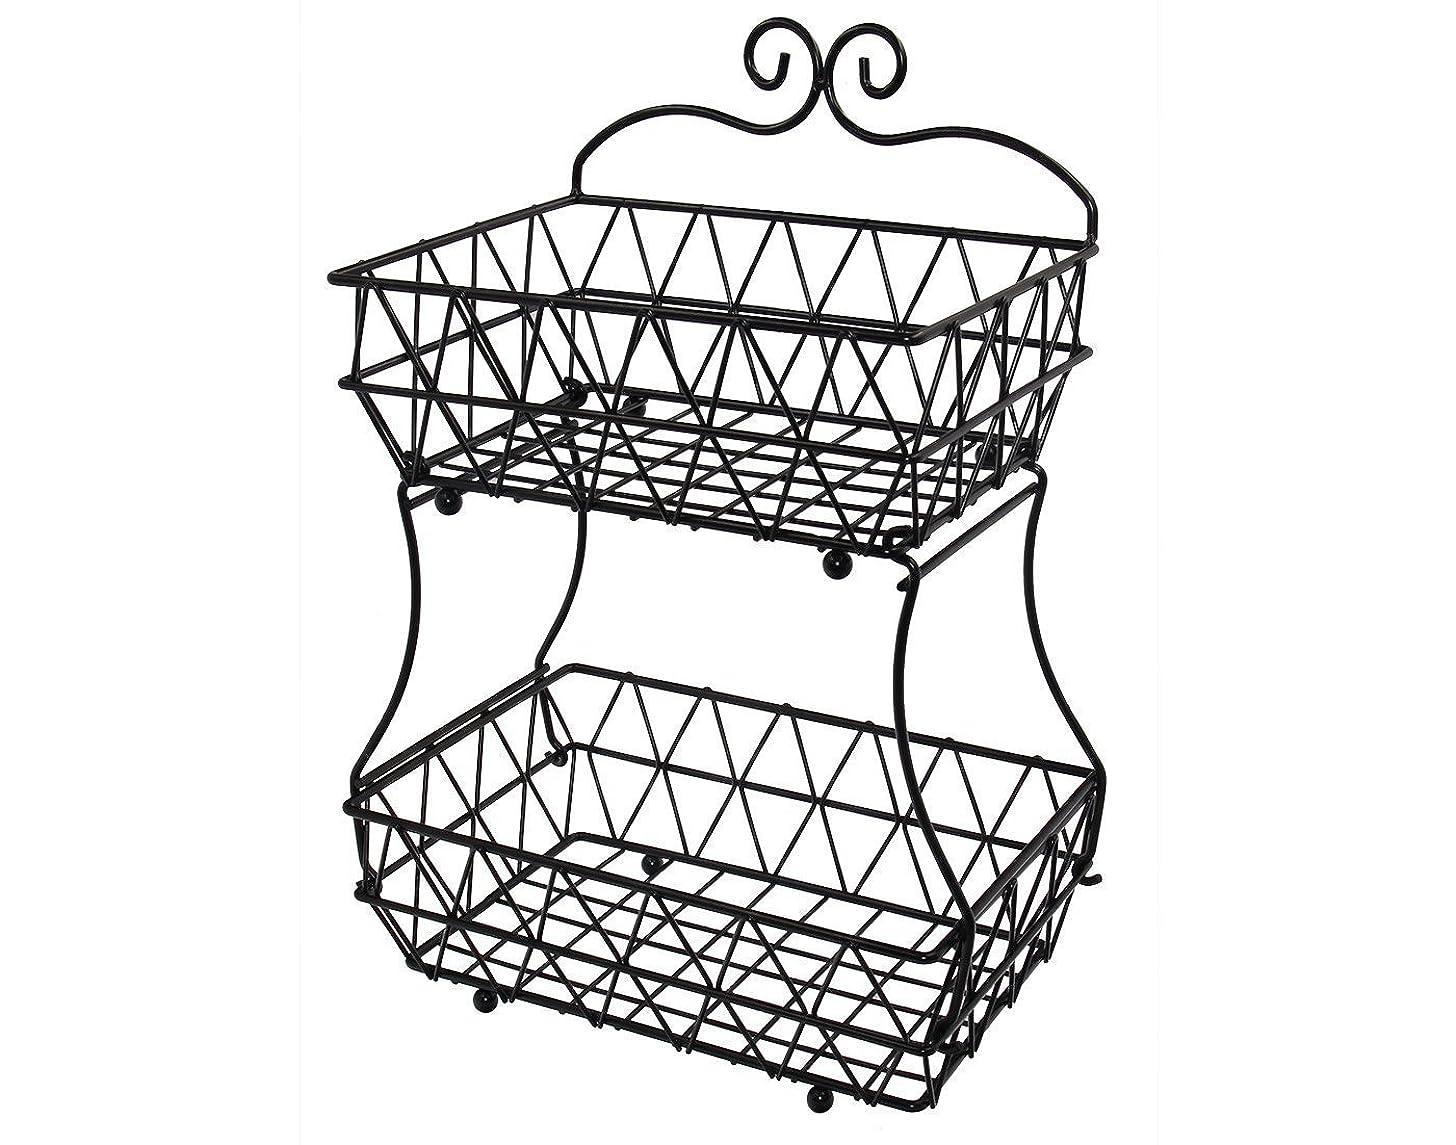 ESYLIFE Upgraded Version 2 Tier Fruit Bread Basket Display Stand - Screws Free Design